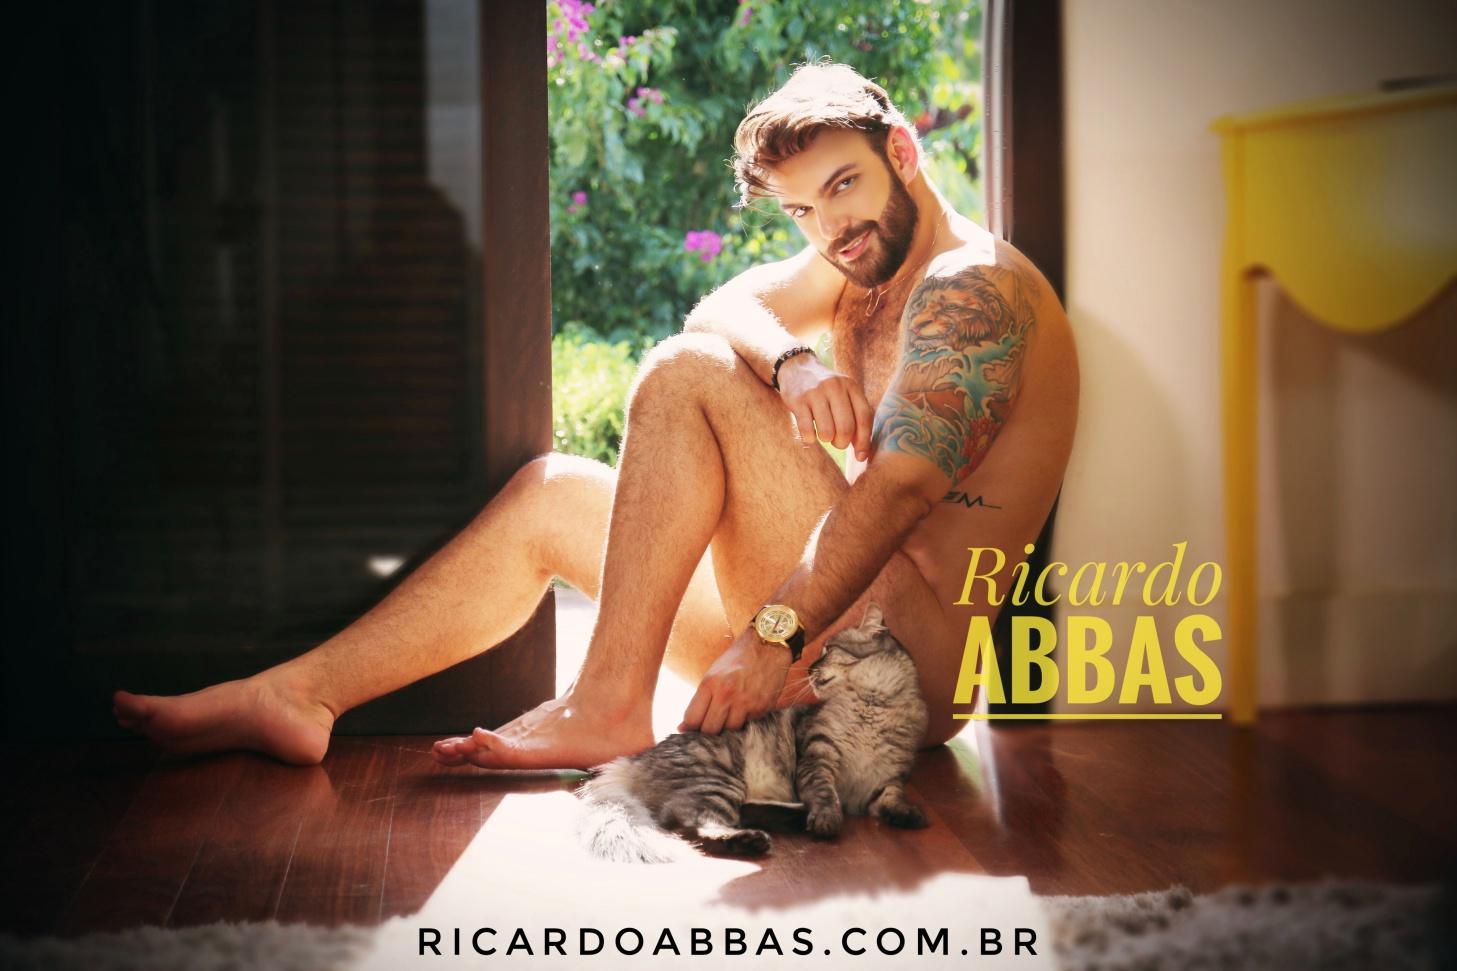 15-RicardoAbbas-Versace_P